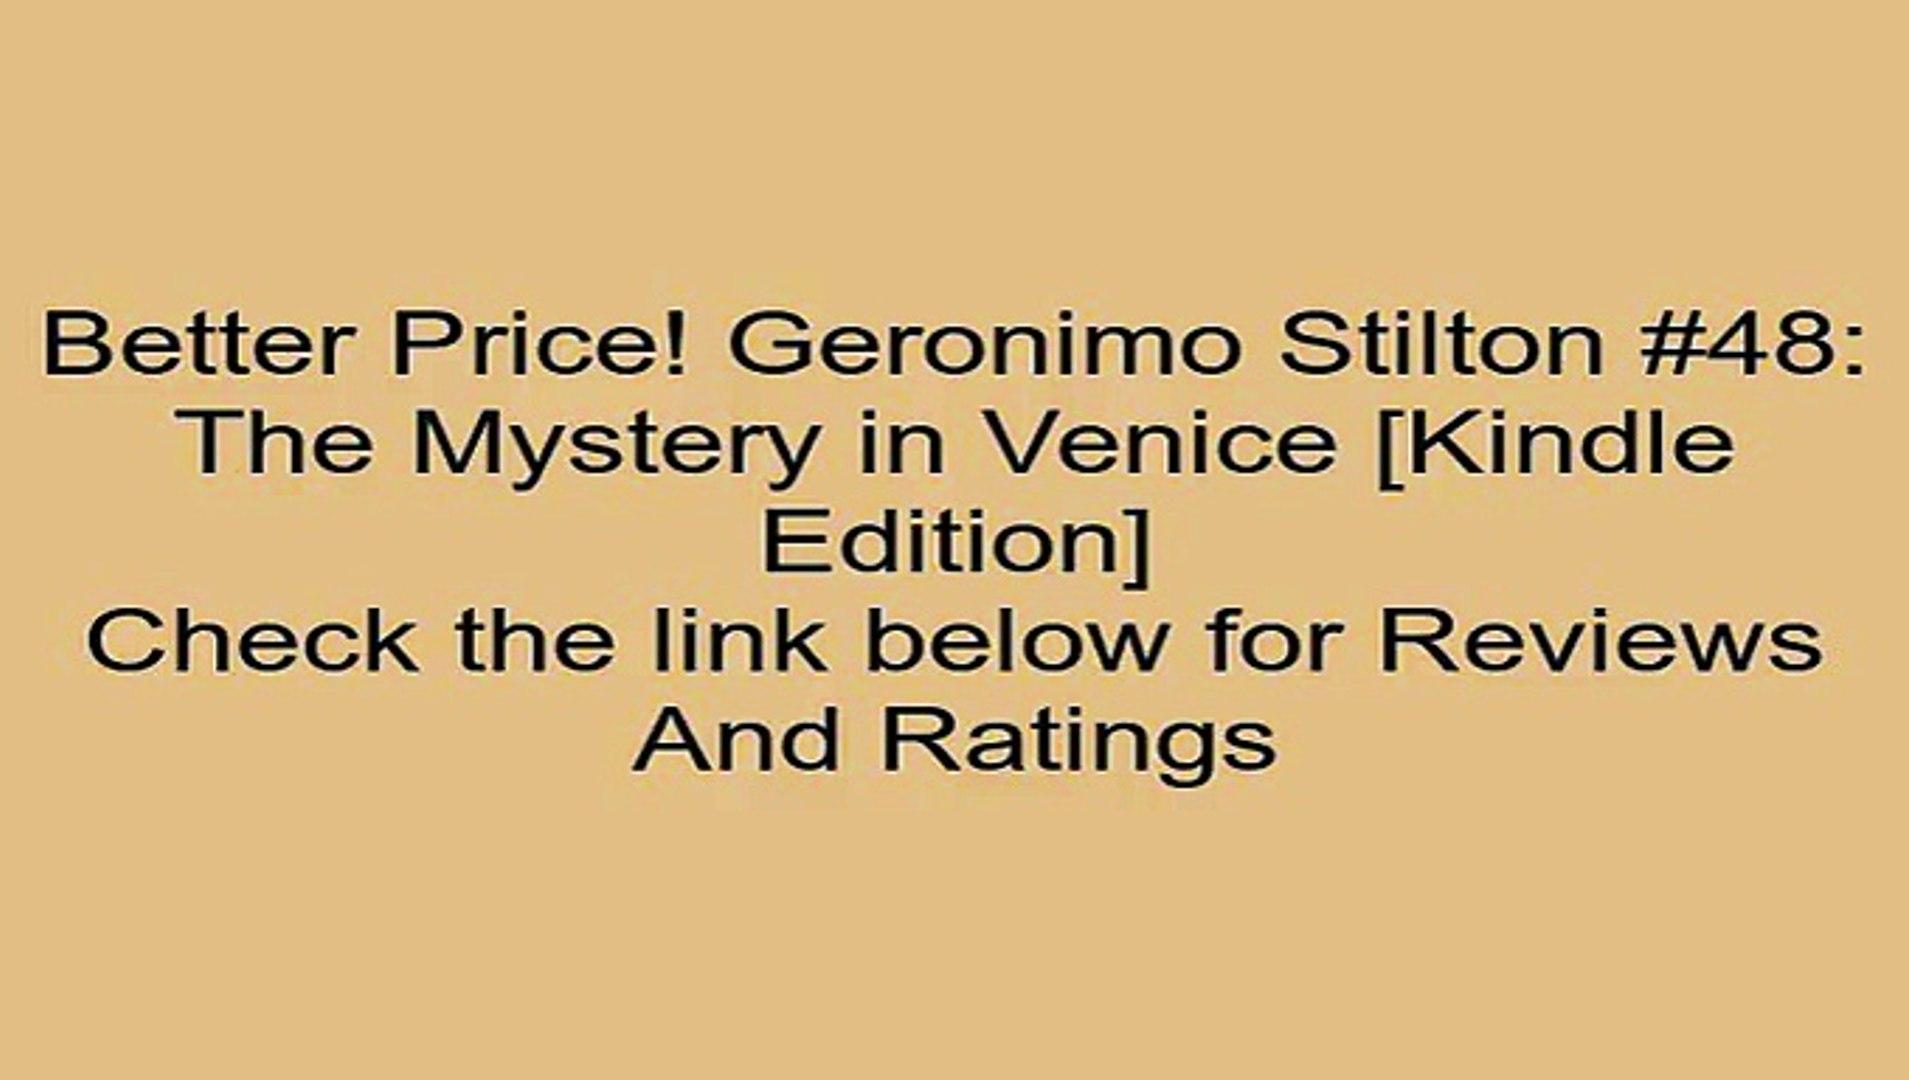 The Mystery in Venice Geronimo Stilton #48